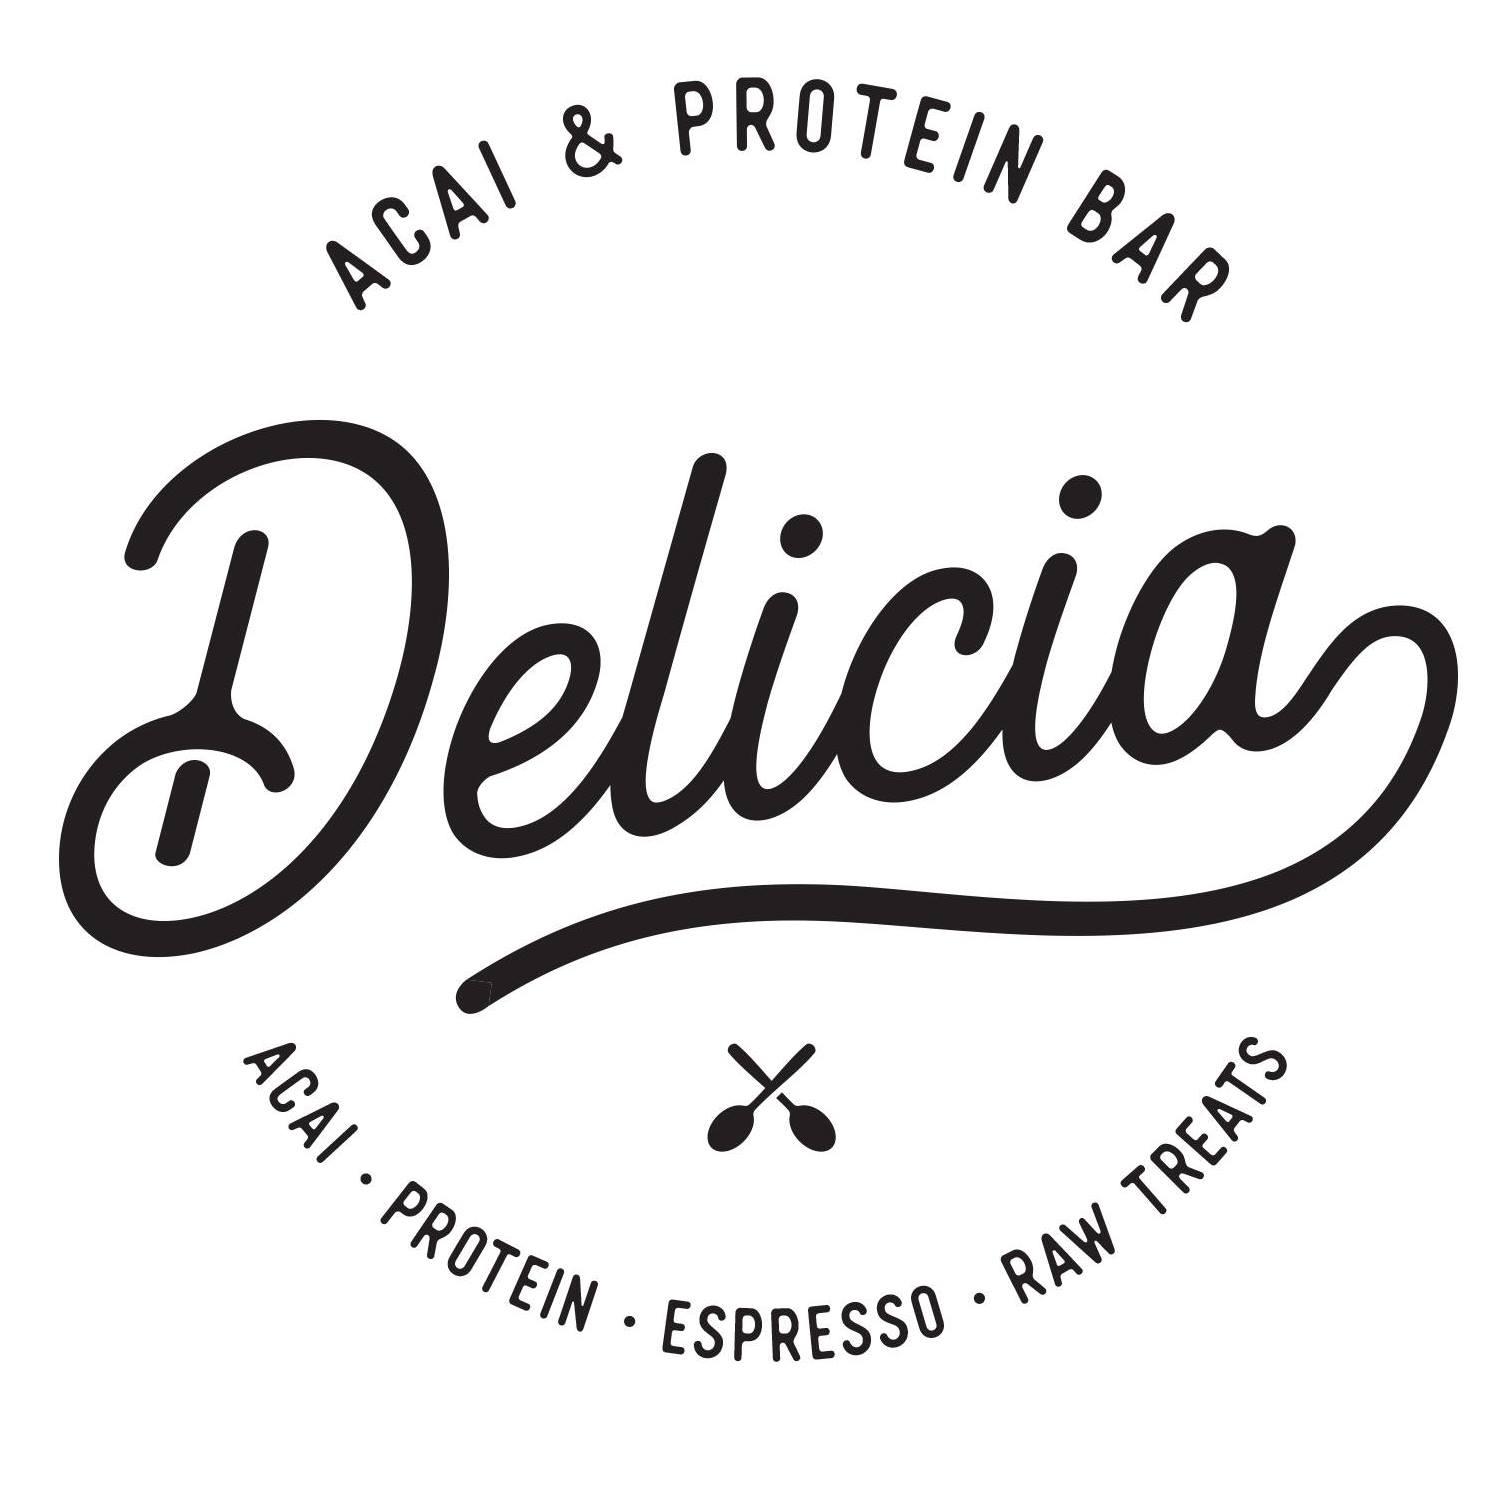 Delicia Acai and Protein Bar